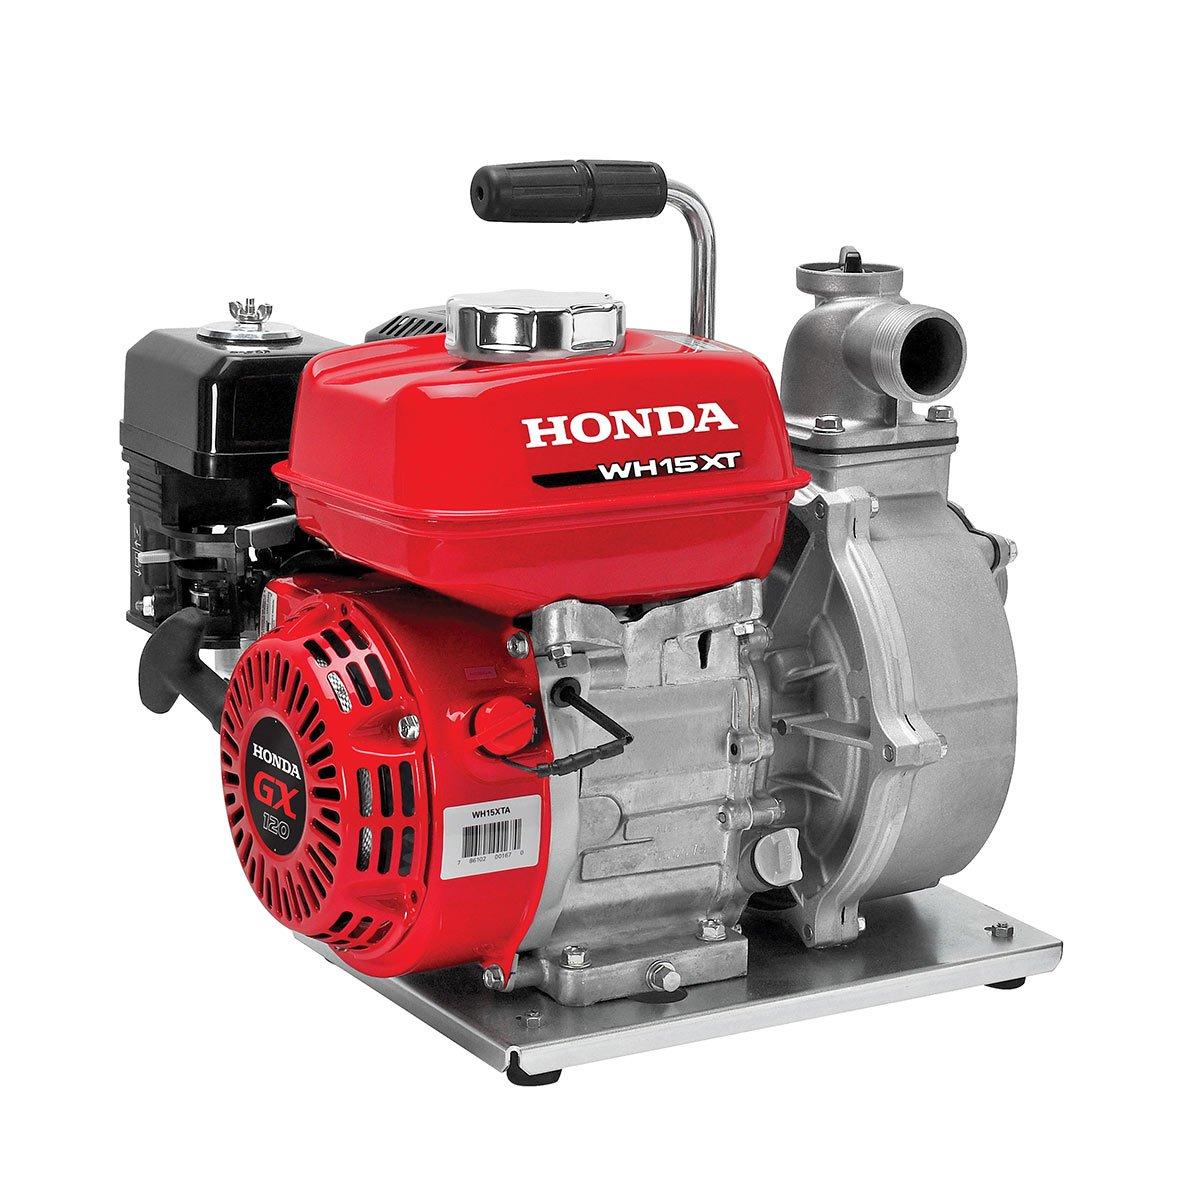 Honda WH15 High Pressure Centrifugal Pump, 1.5''